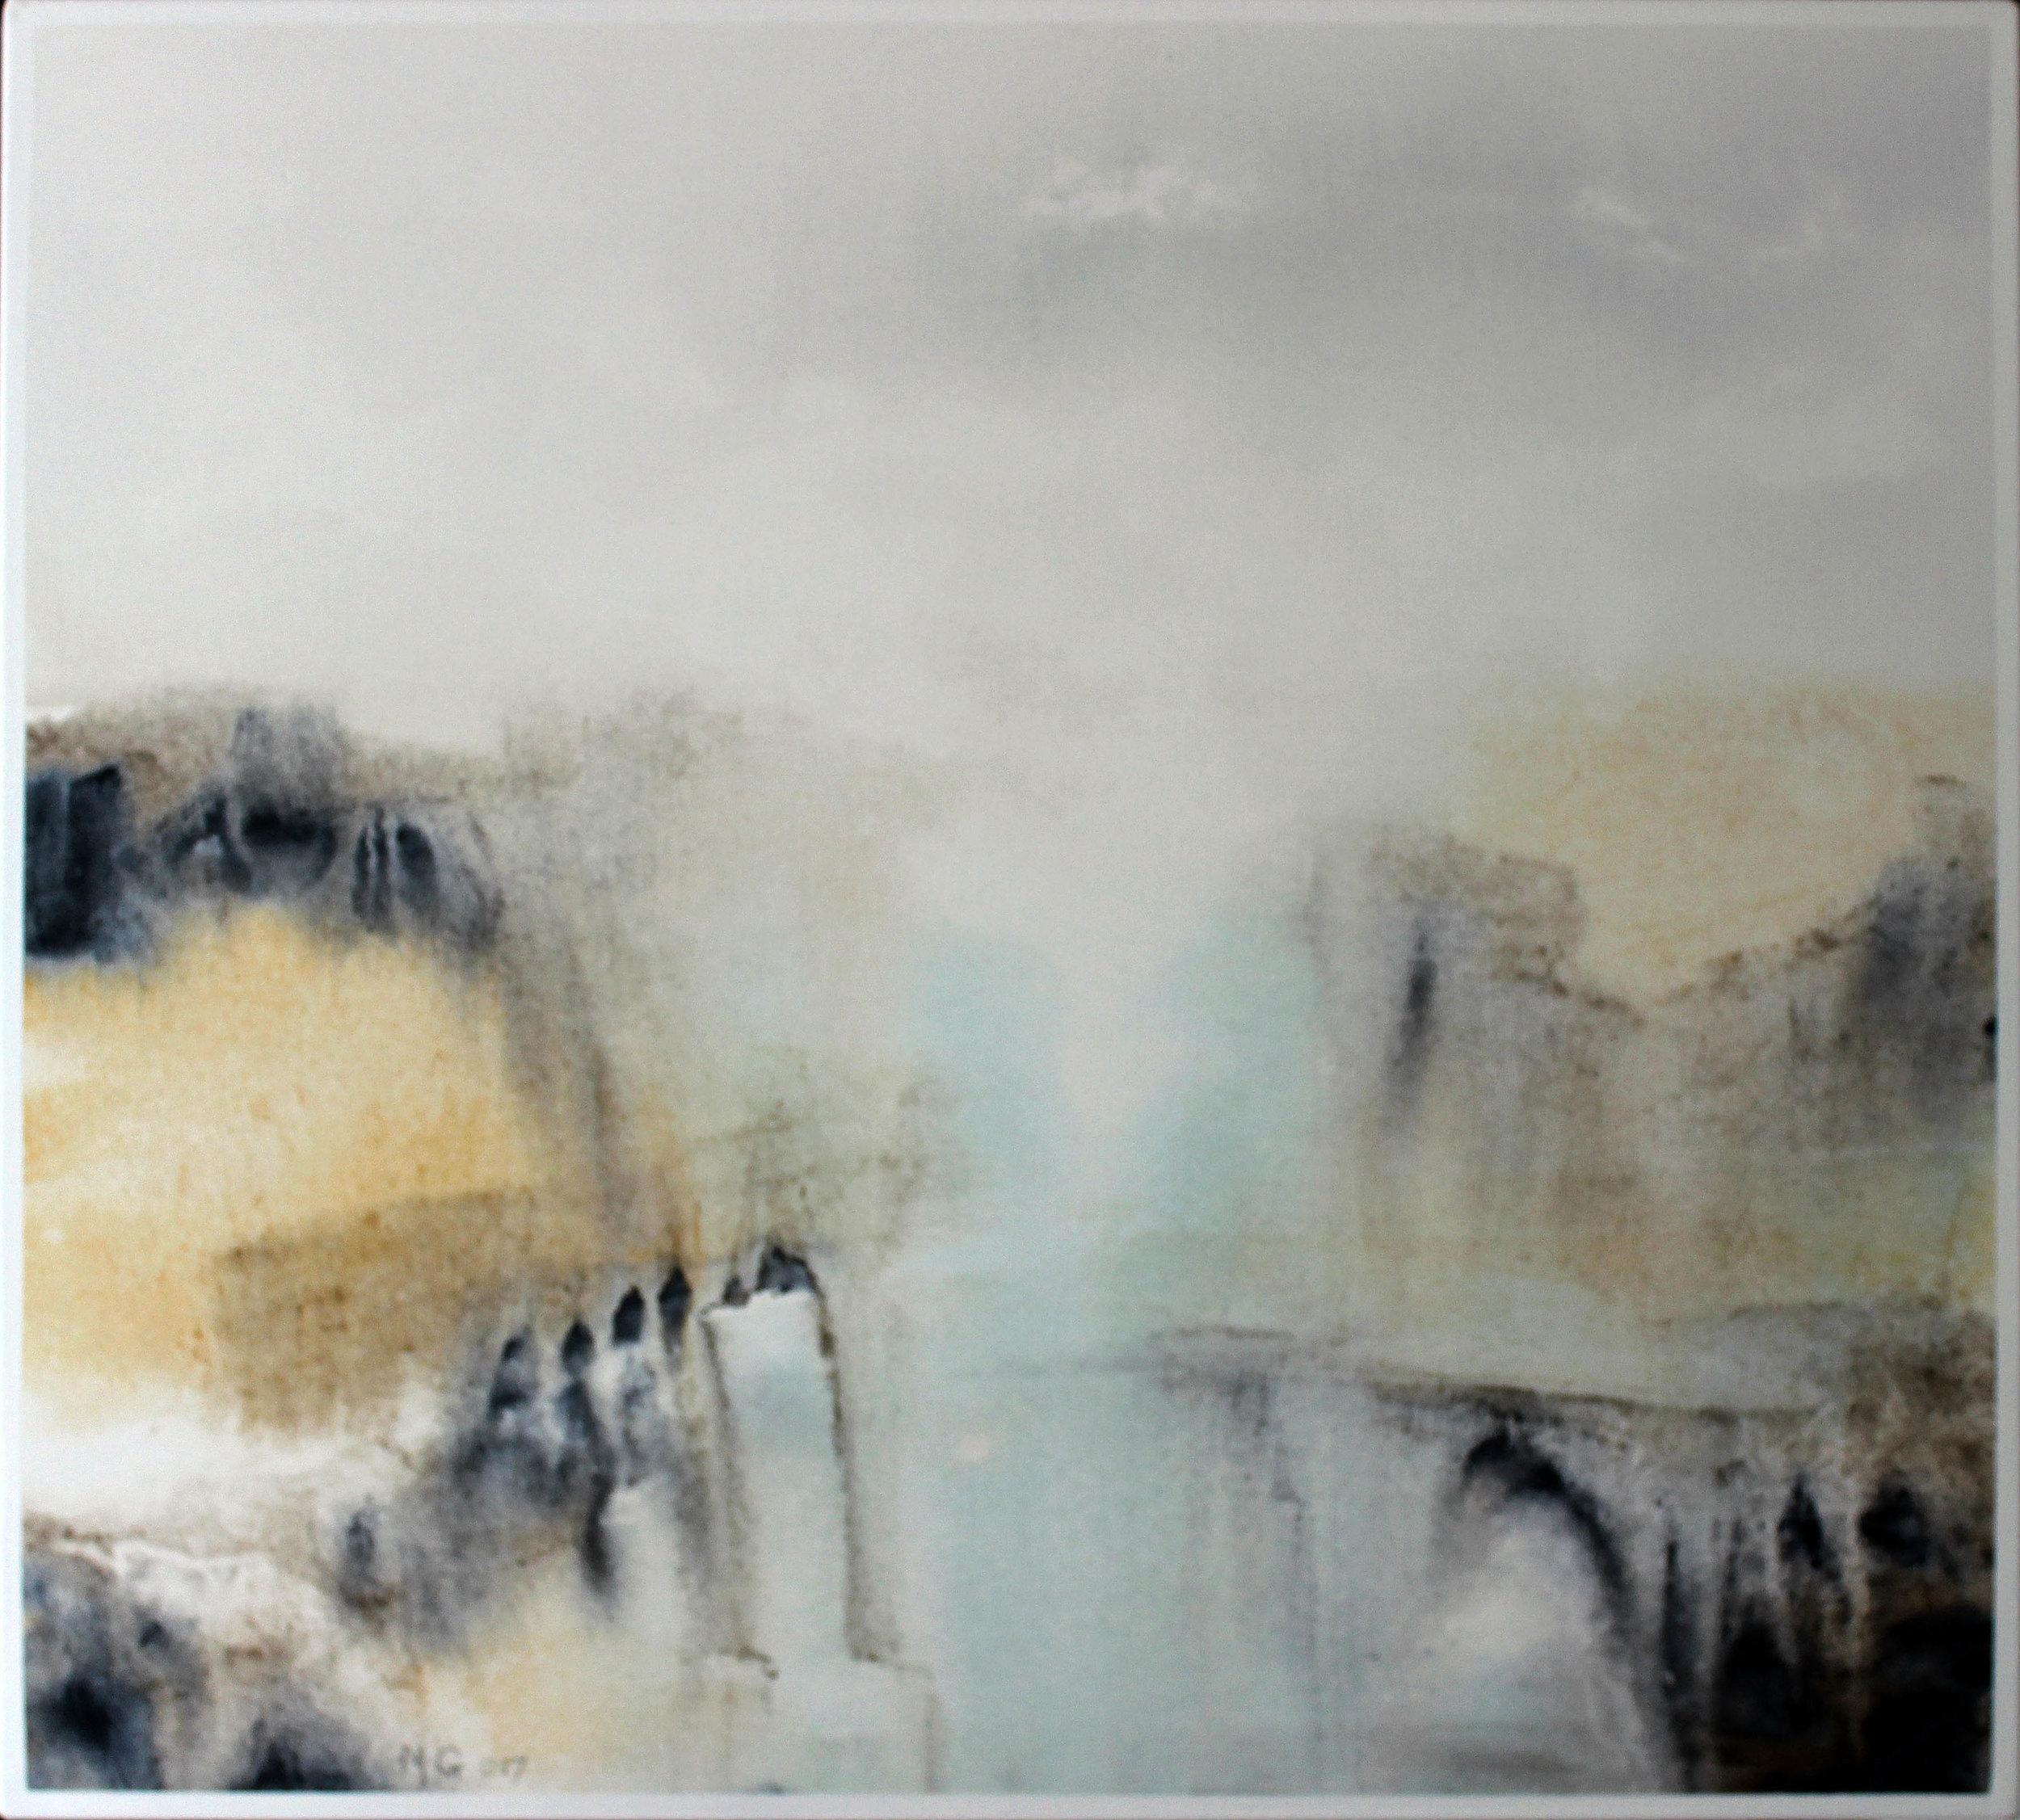 4. GALLAGHER_Martin_Shangrila Morning_76cmx76cm_Acrylic on Canvas.jpg